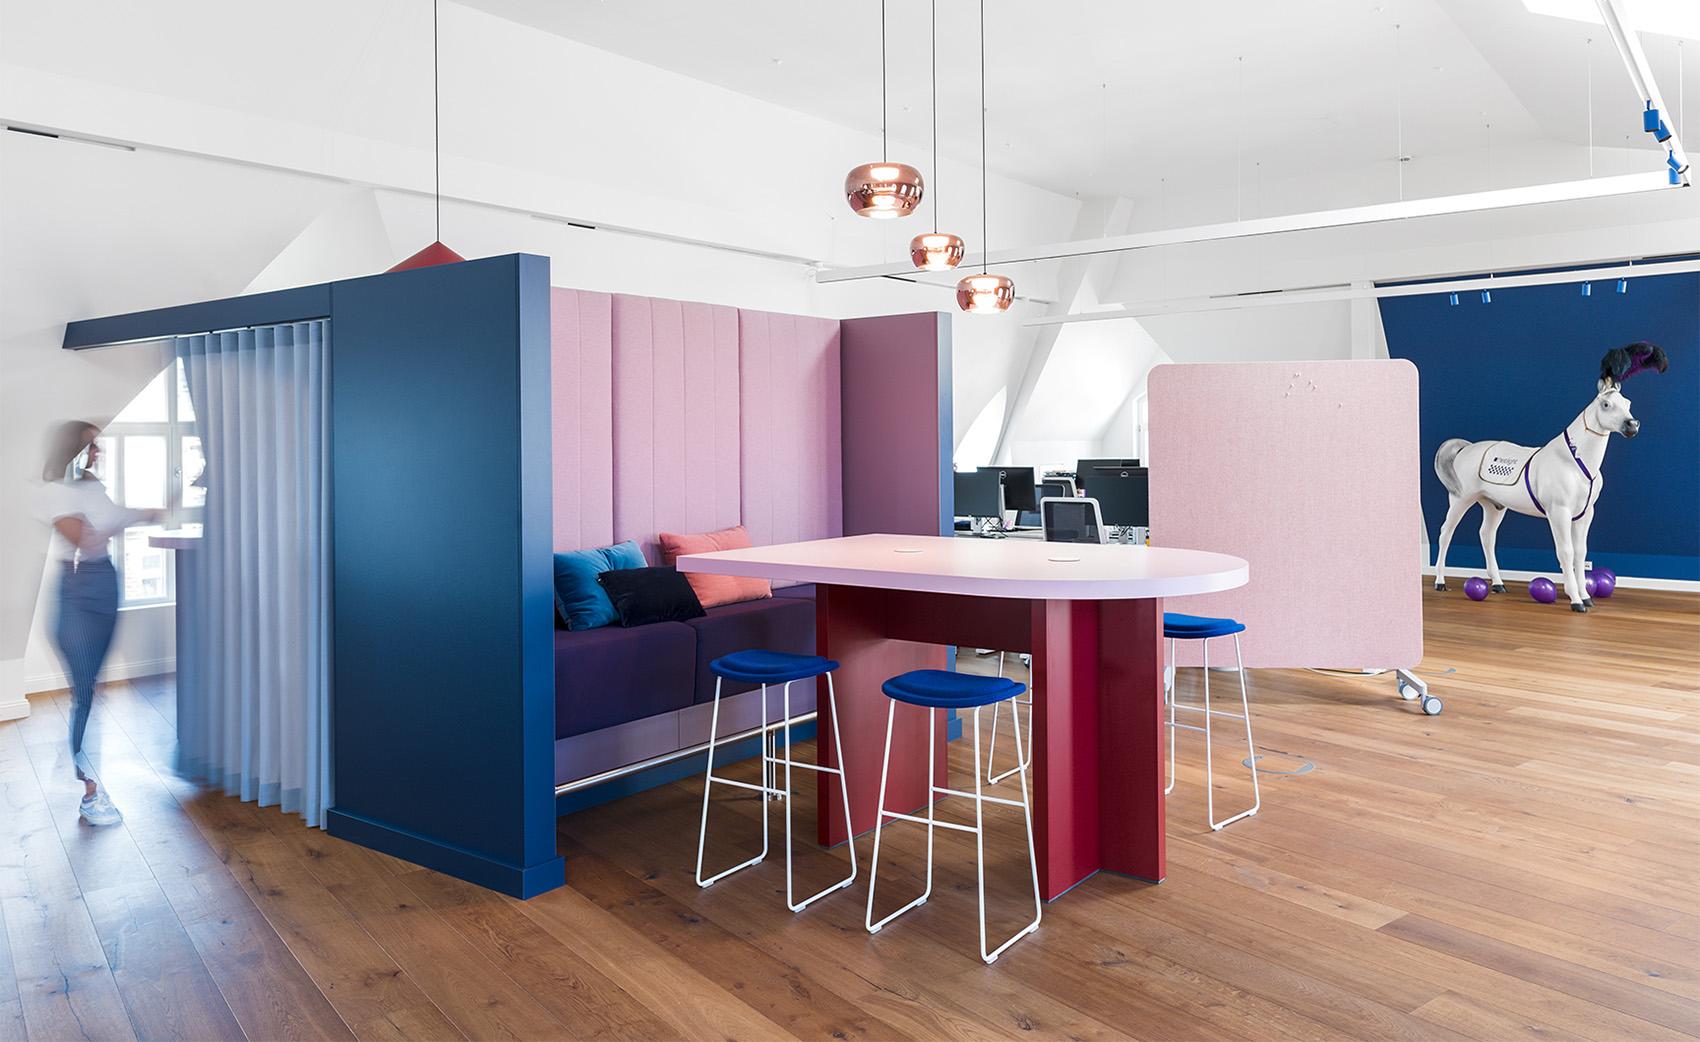 A Tour of Netlight's Cool New Hamburg Office